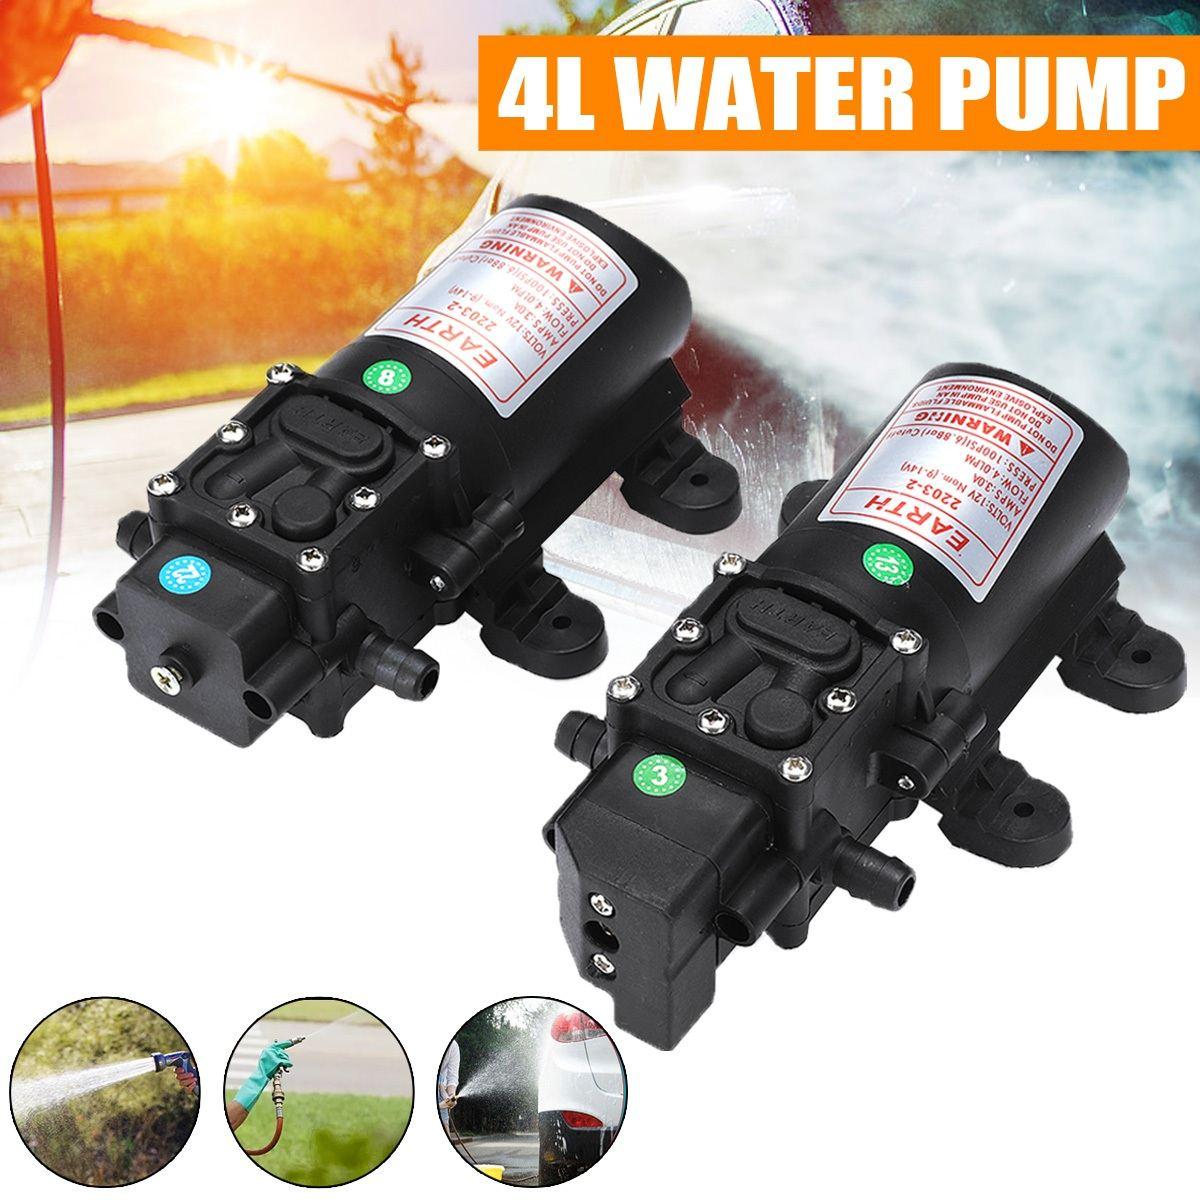 Dc 12 v micro elétrica refluxo diafragma bomba de água inteligente interruptor automático 6l/min alta pressão lavagem do carro spray bomba de água